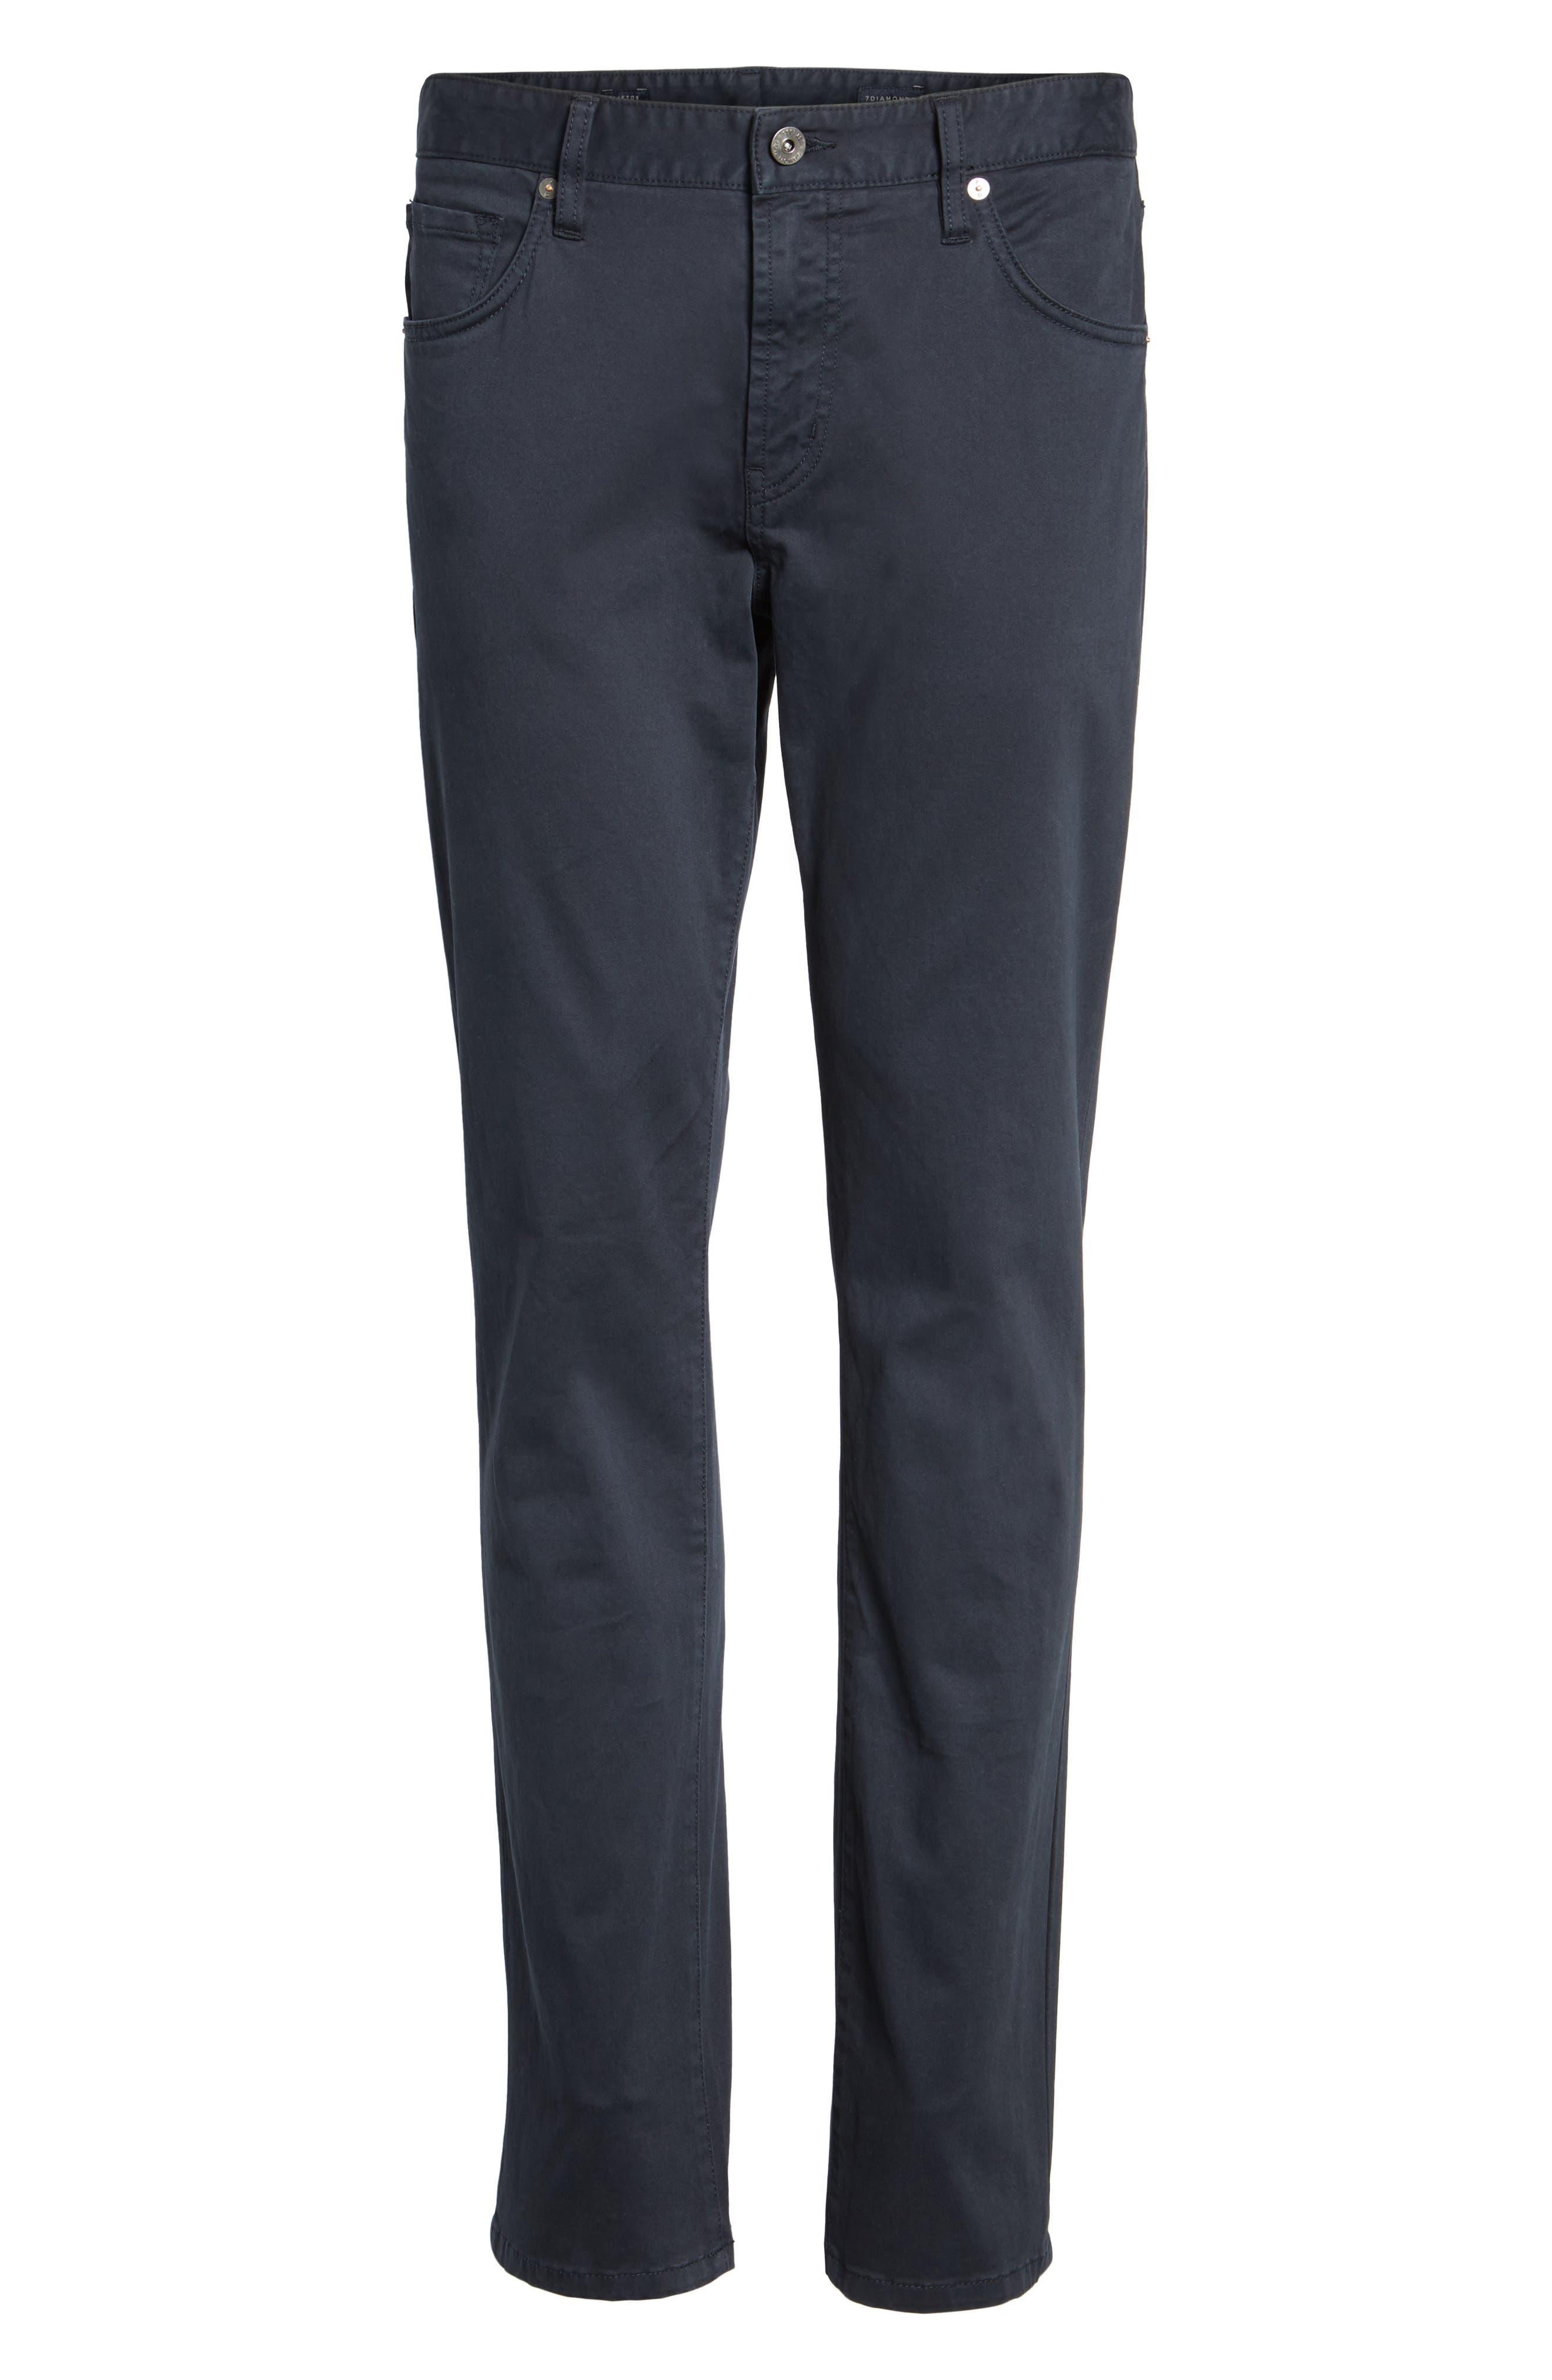 Brushed Twill Five-Pocket Pants,                             Alternate thumbnail 6, color,                             Navy